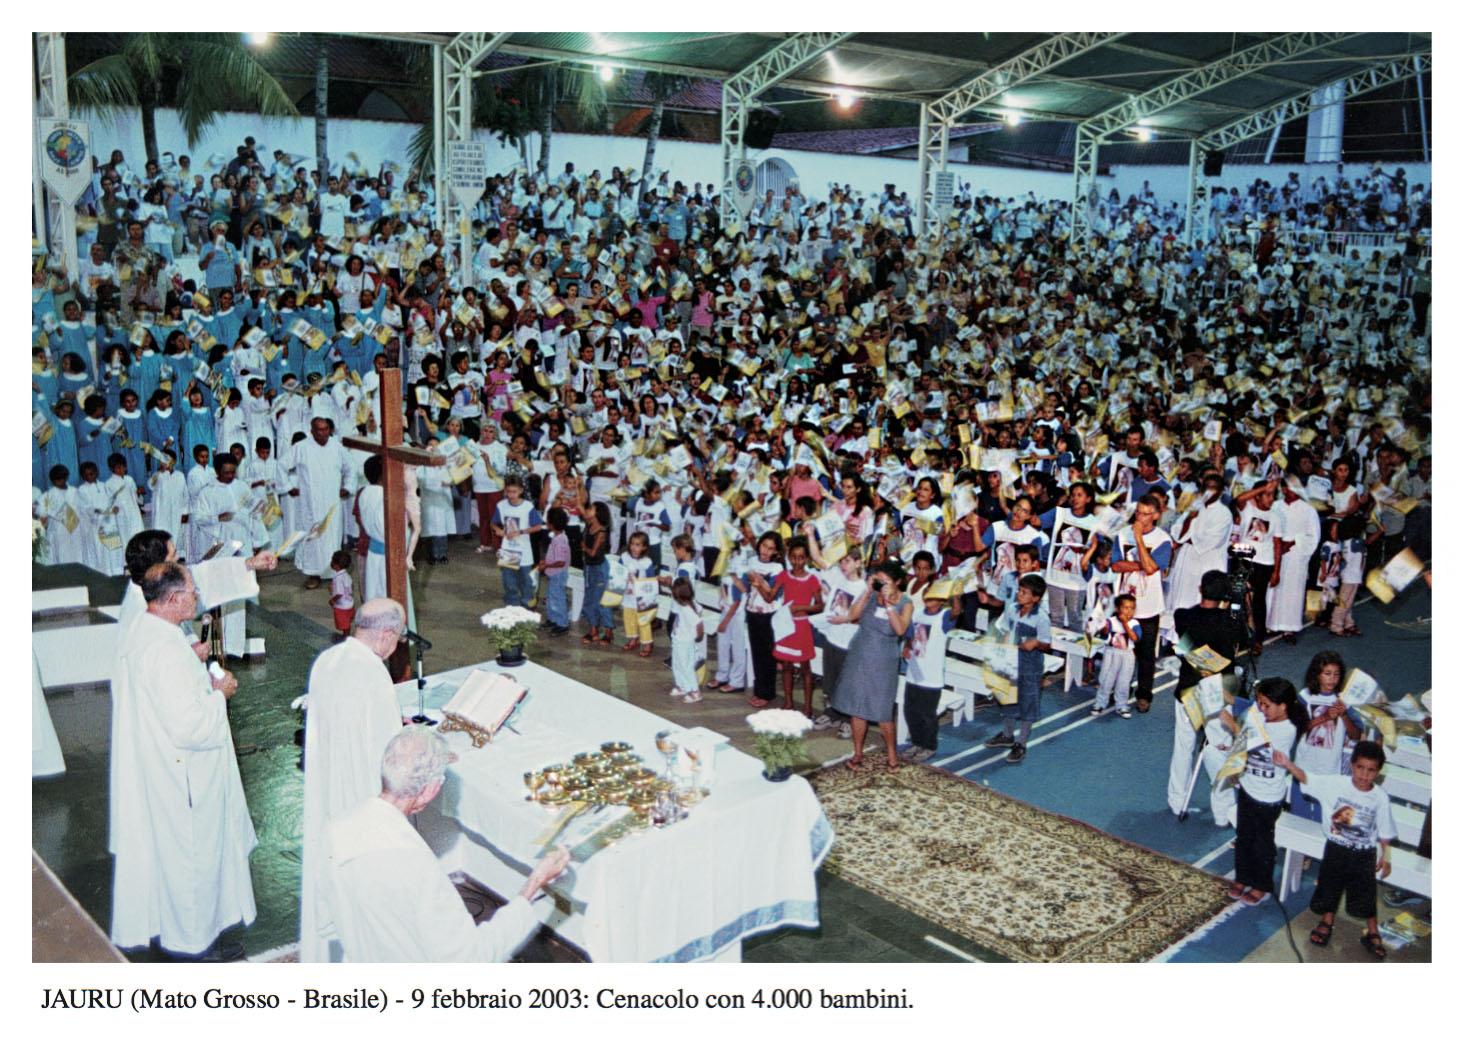 2003-02-09 BRASILE-Jauru